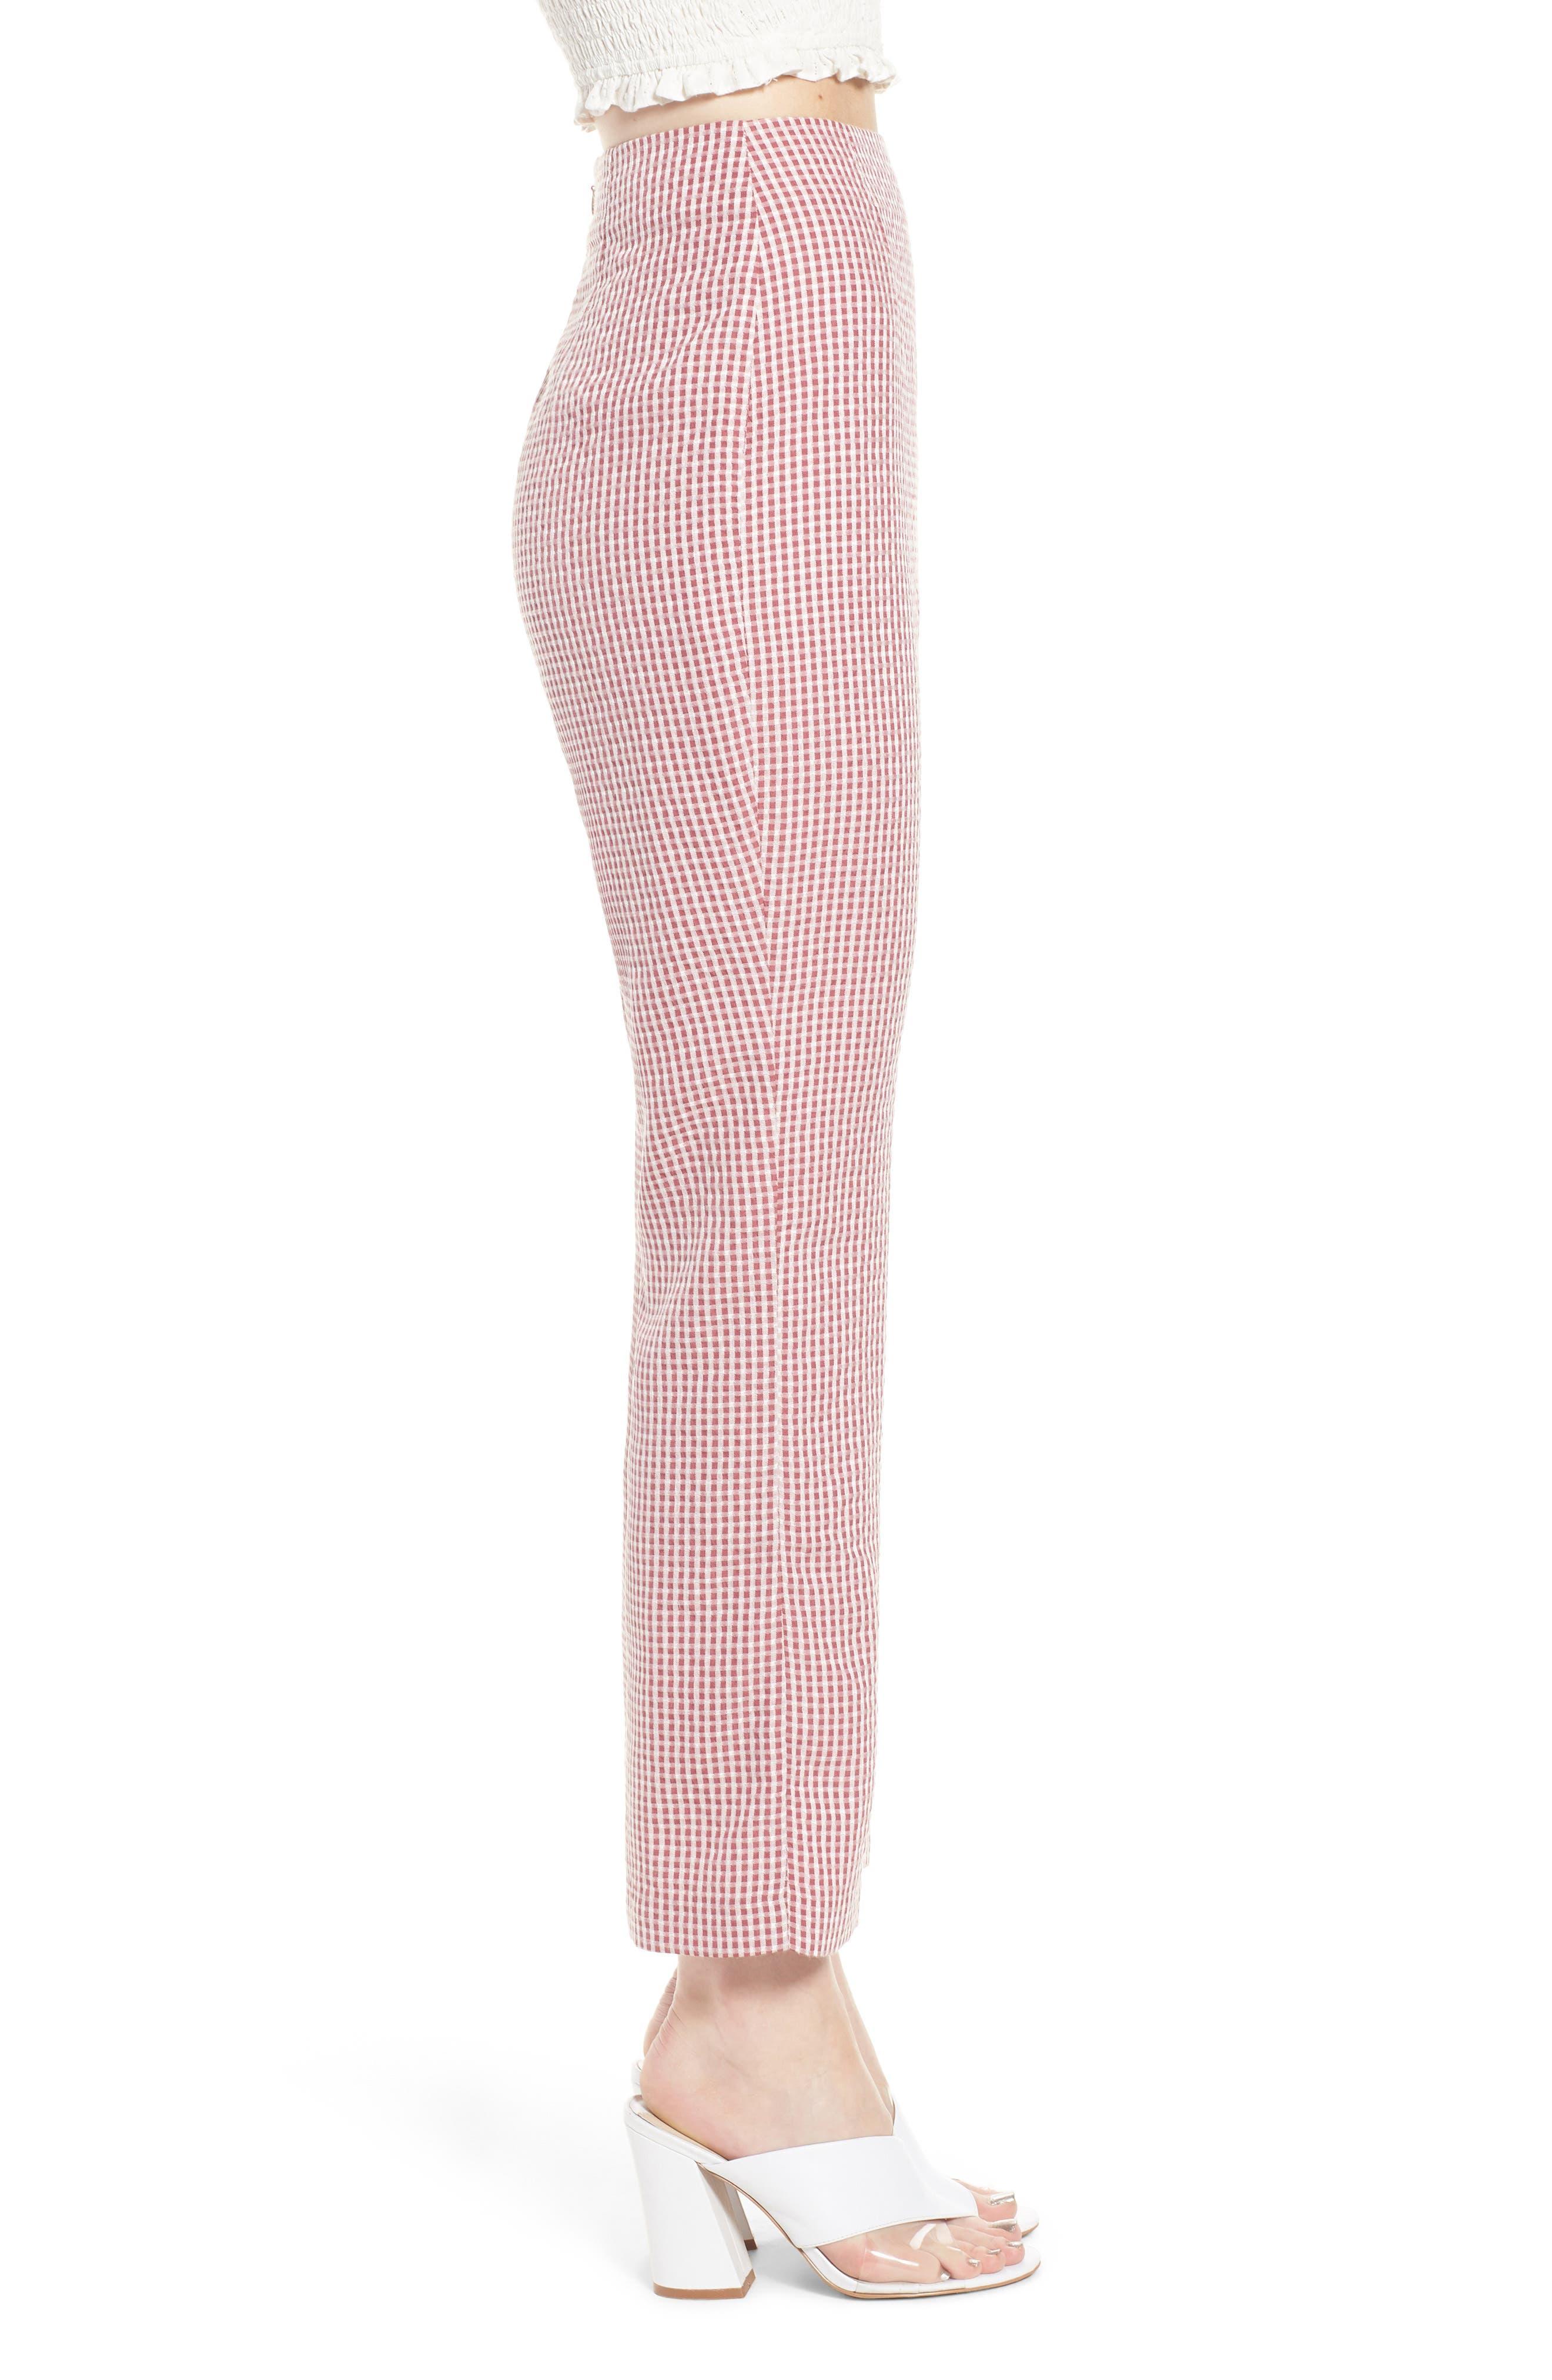 Pisa High Waist Crop Pants,                             Alternate thumbnail 3, color,                             RED GINGHAM